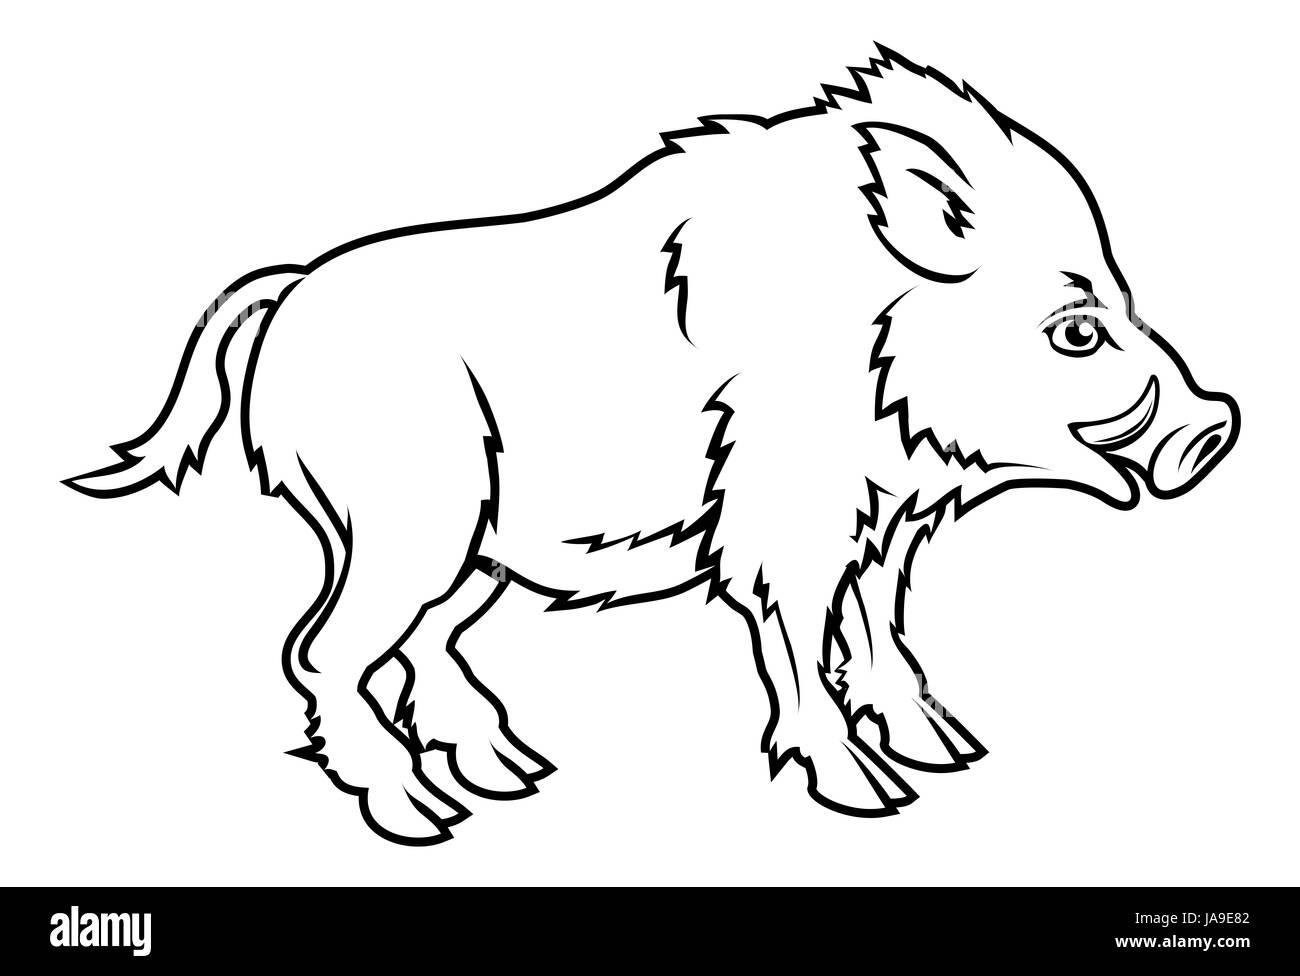 birth, childbirth, parturition, delivery, graphic, animal, wild, new, - Stock Image